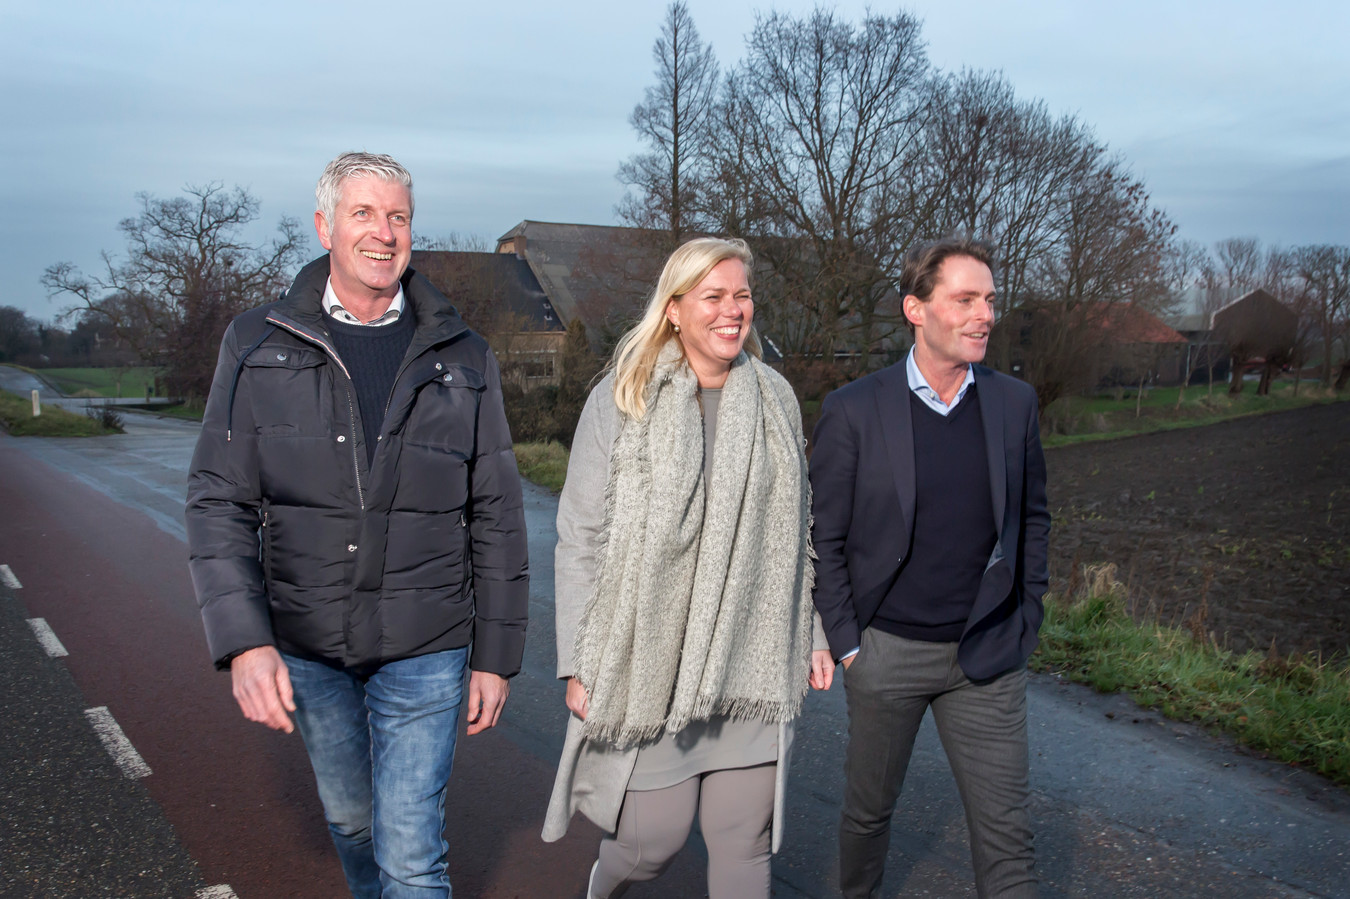 Ondernemer Paul Konijnendijk (l), agrariër Mellany Klompe en wethouder Paul Boogaard willen de Hoeksche Waard op de kaart zetten.